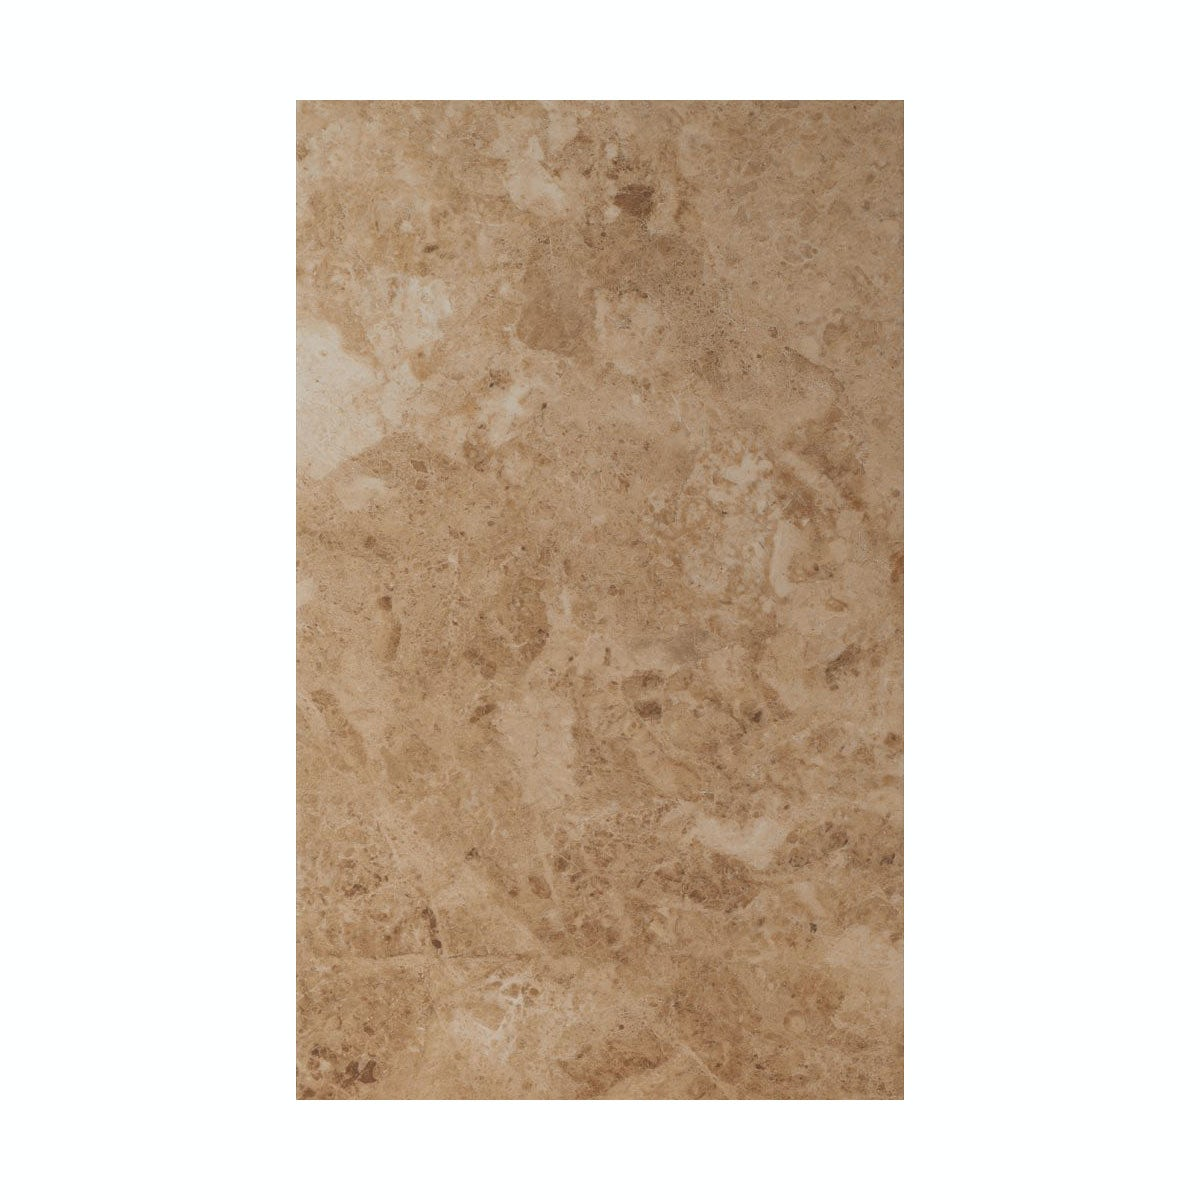 British Ceramic Tile Face dark beige matt tile 298mm x 498mm